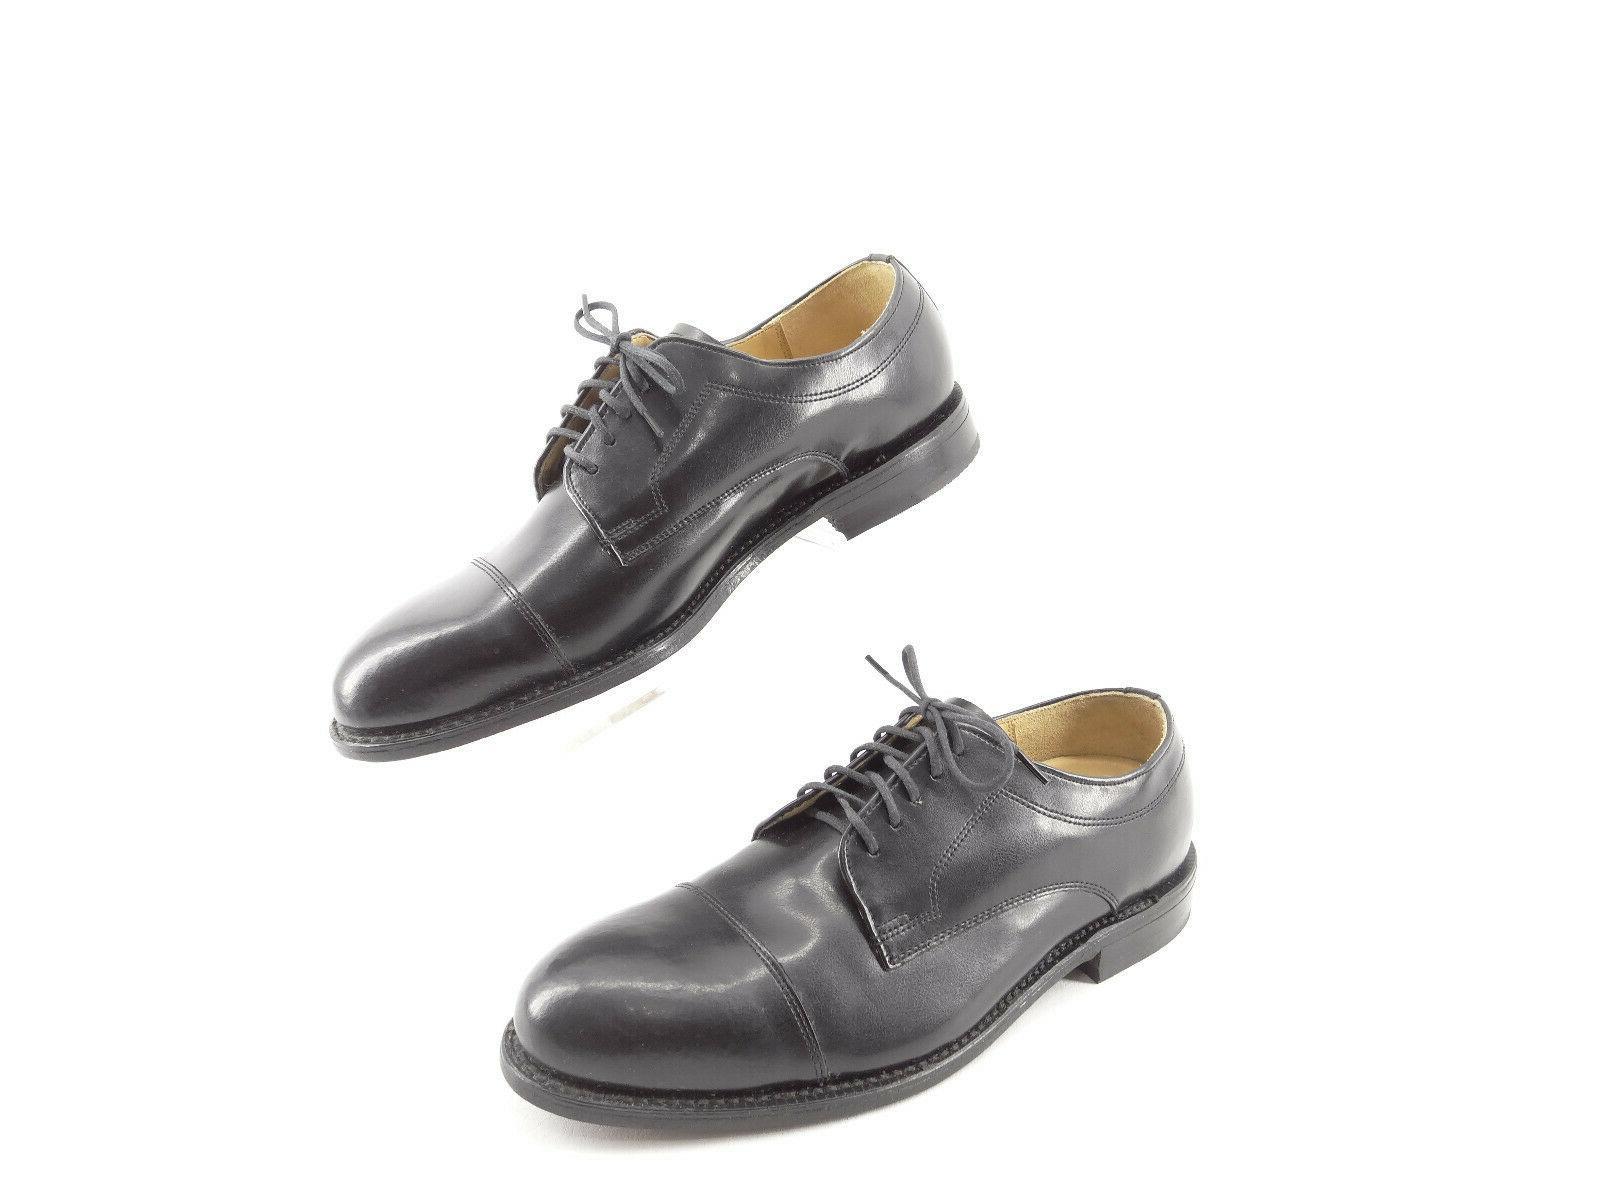 comfort black leather cap toe oxford dress